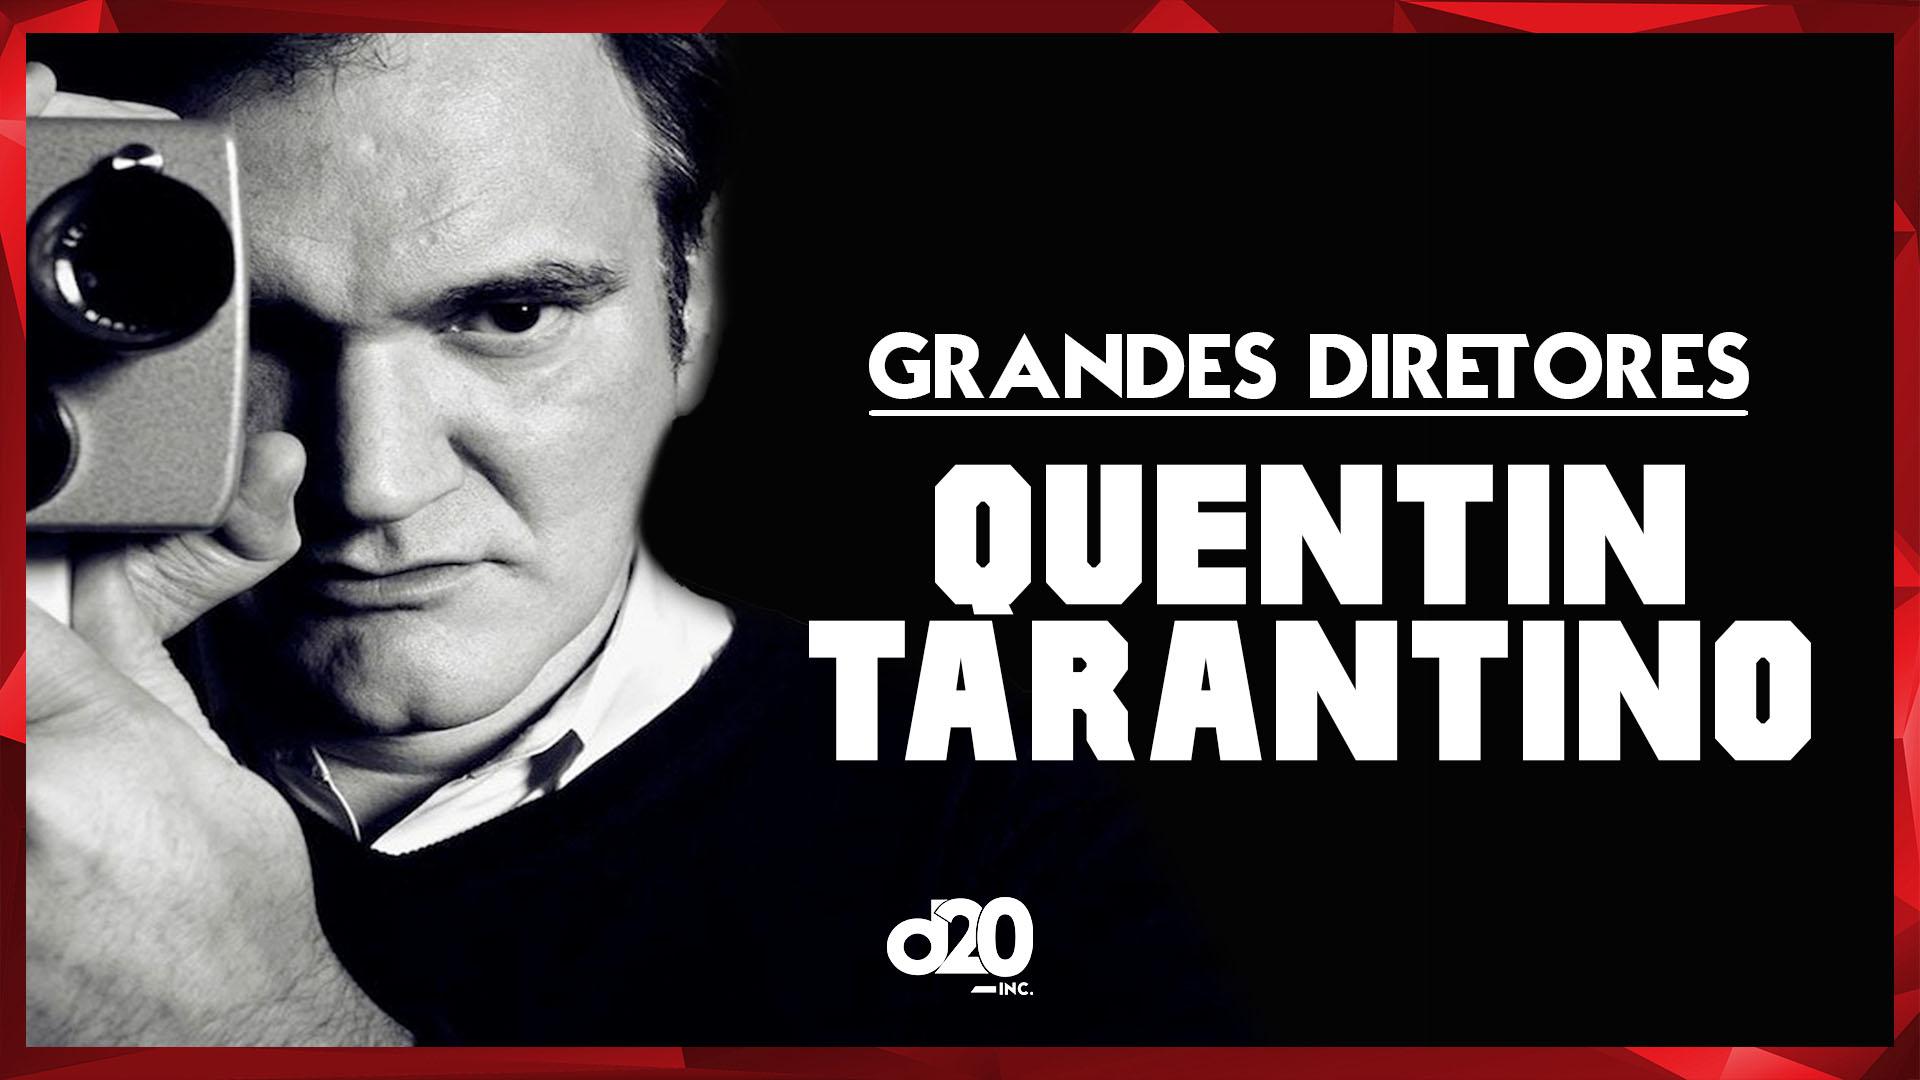 Quentin Tarantino (Grandes Diretores) | D20 Lab 54